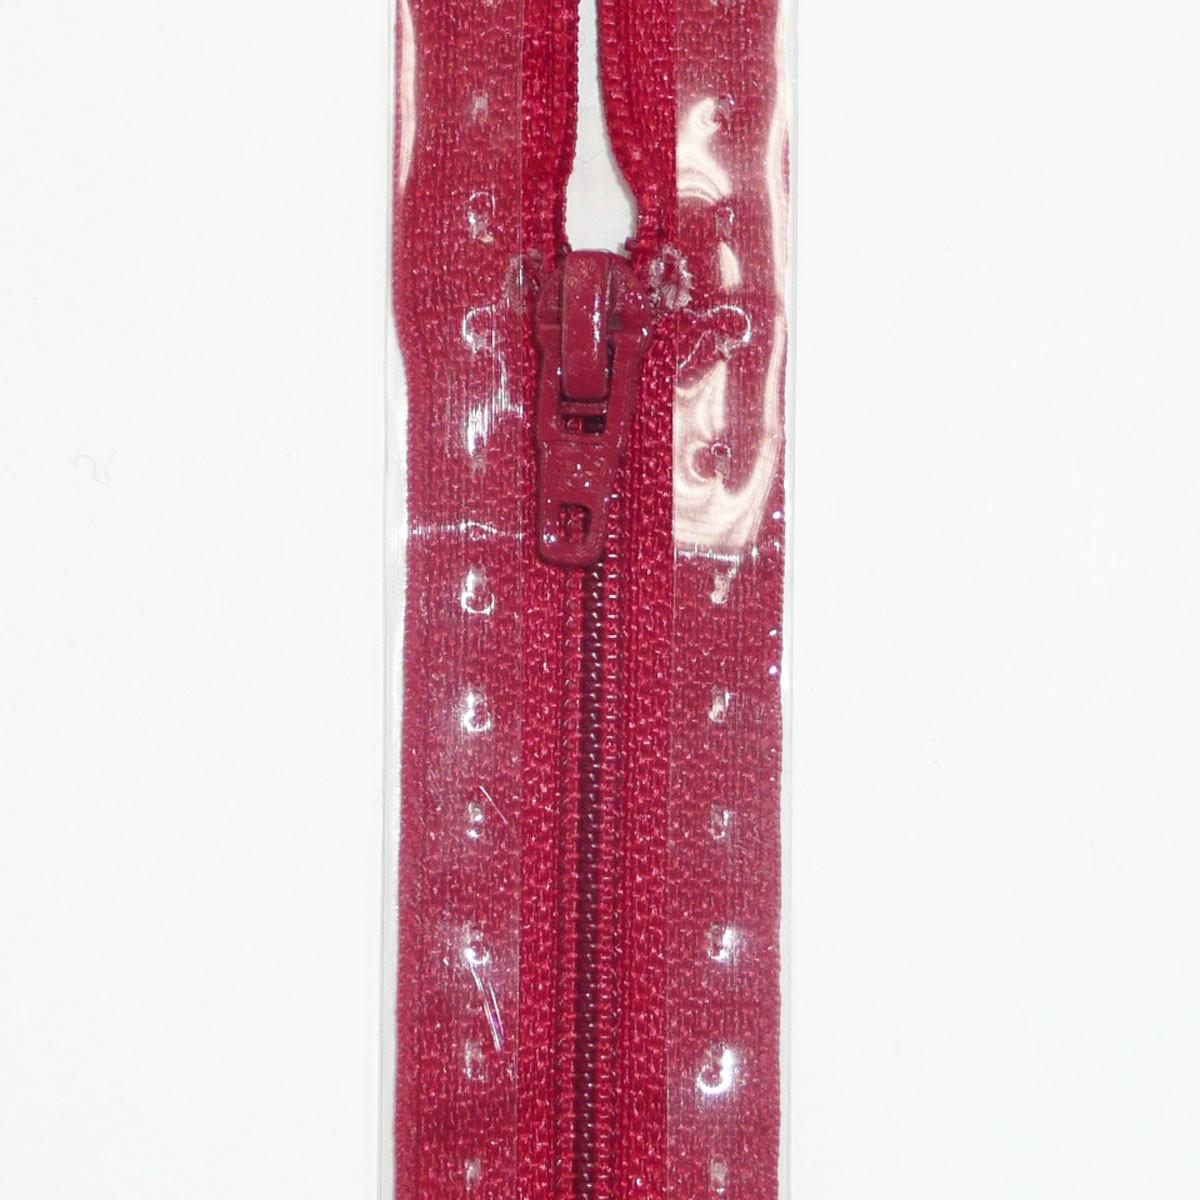 Reißverschluss S1 Typ 0 ut 15 cm Flach granatrot